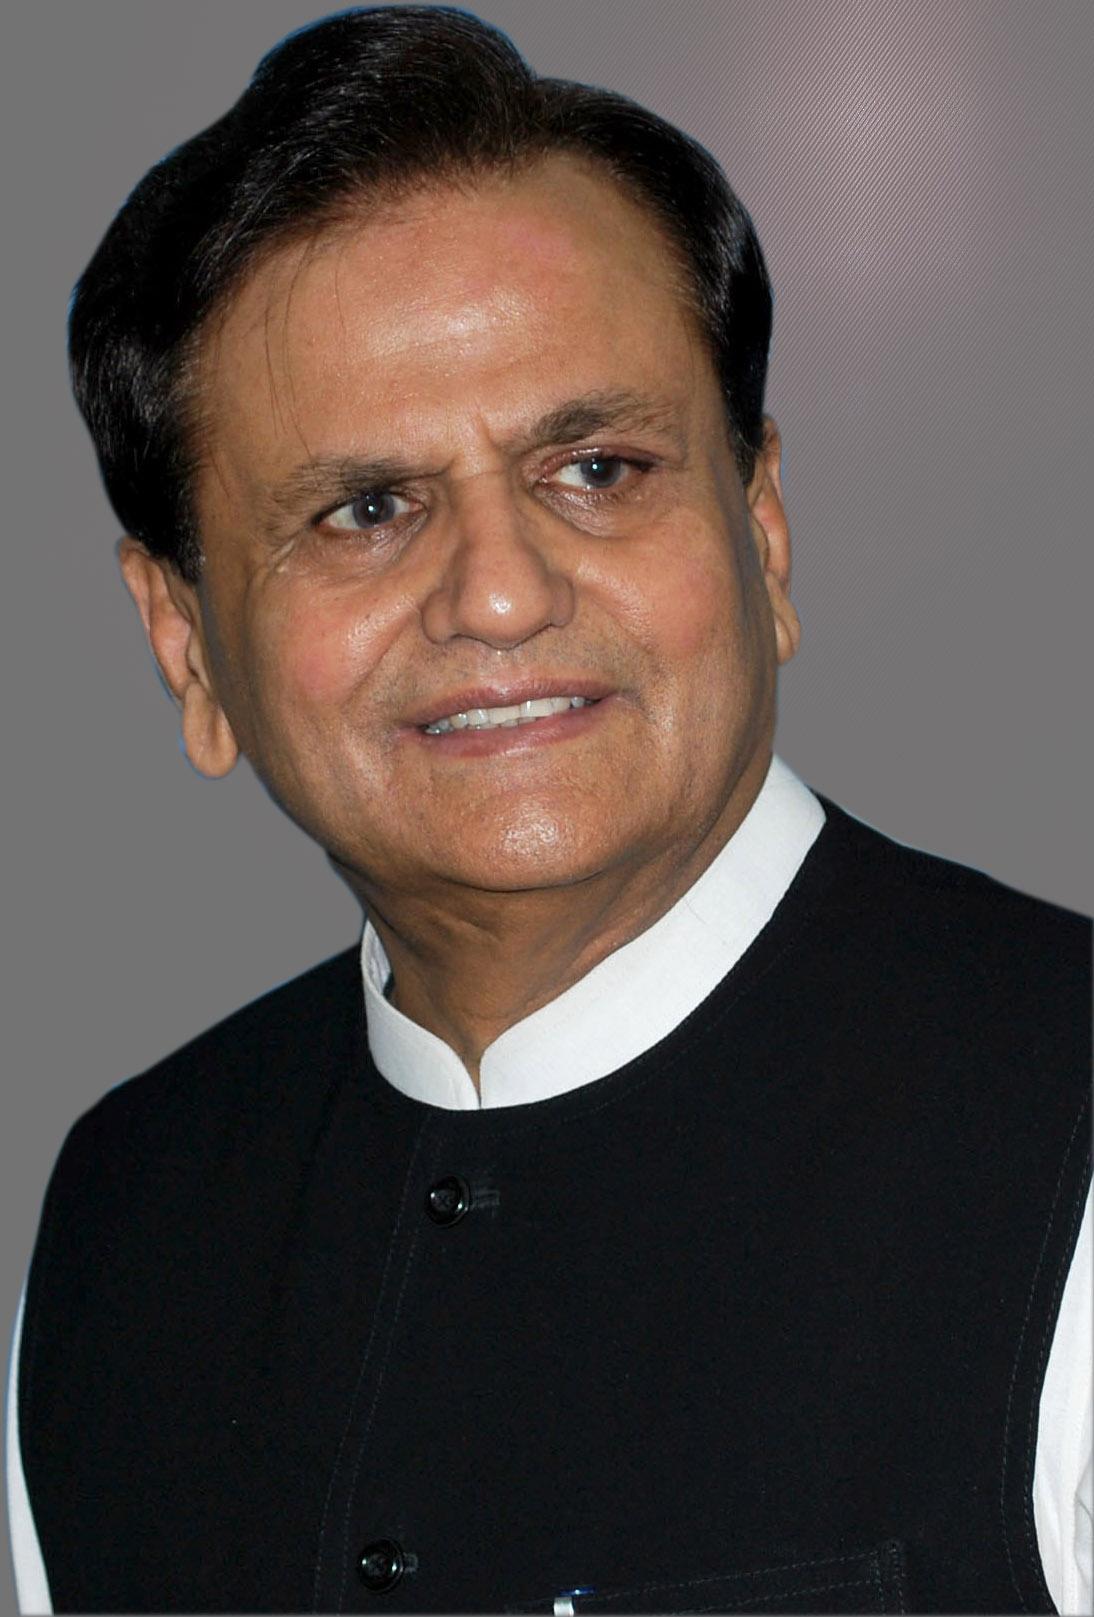 Ahmed Patel